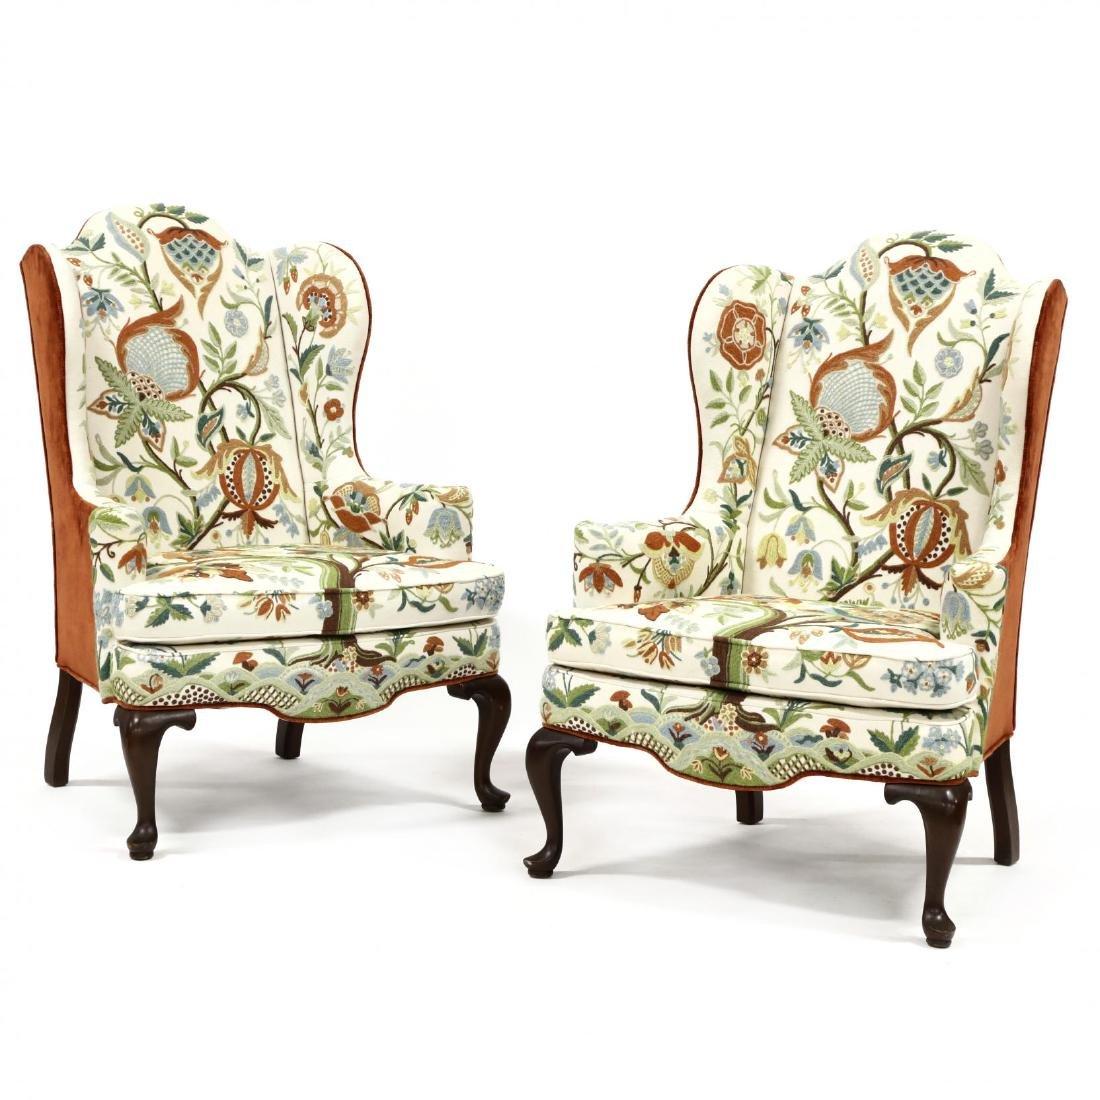 Woodmark Originals, Pair of Crewelwork Upholstered Wing